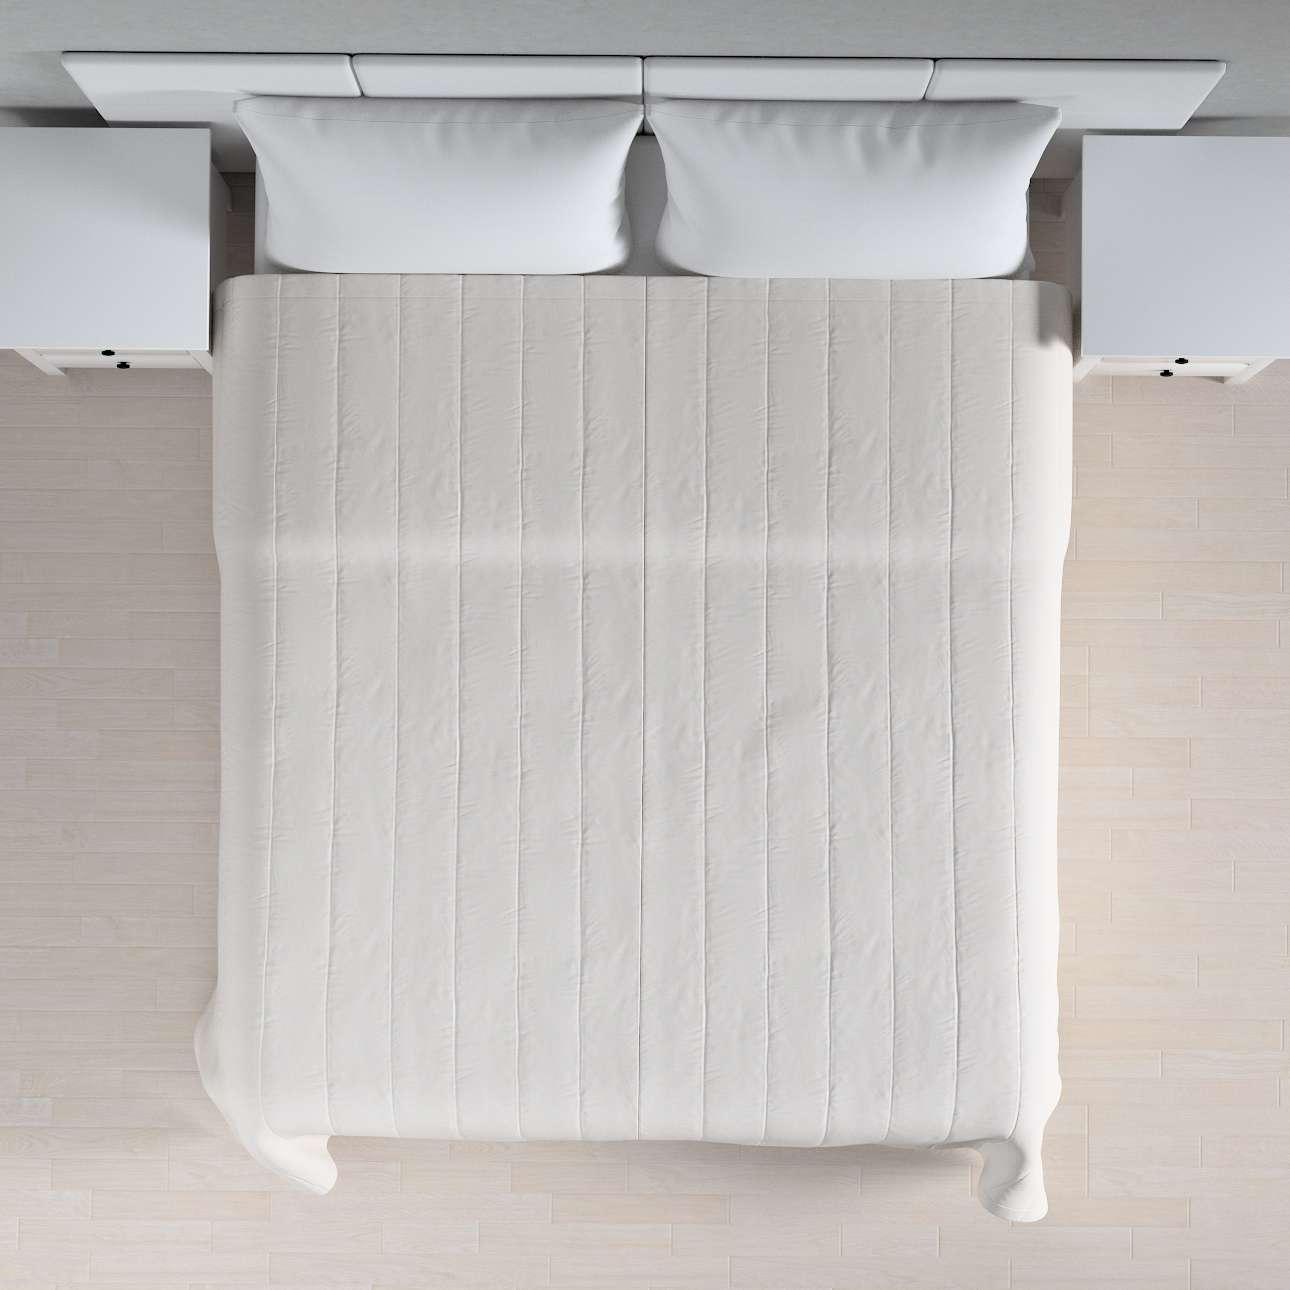 Sengetæppe quiltet<br/>10cm striber 120g/m 260 x 210 cm fra kollektionen Linen, Stof: 392-04